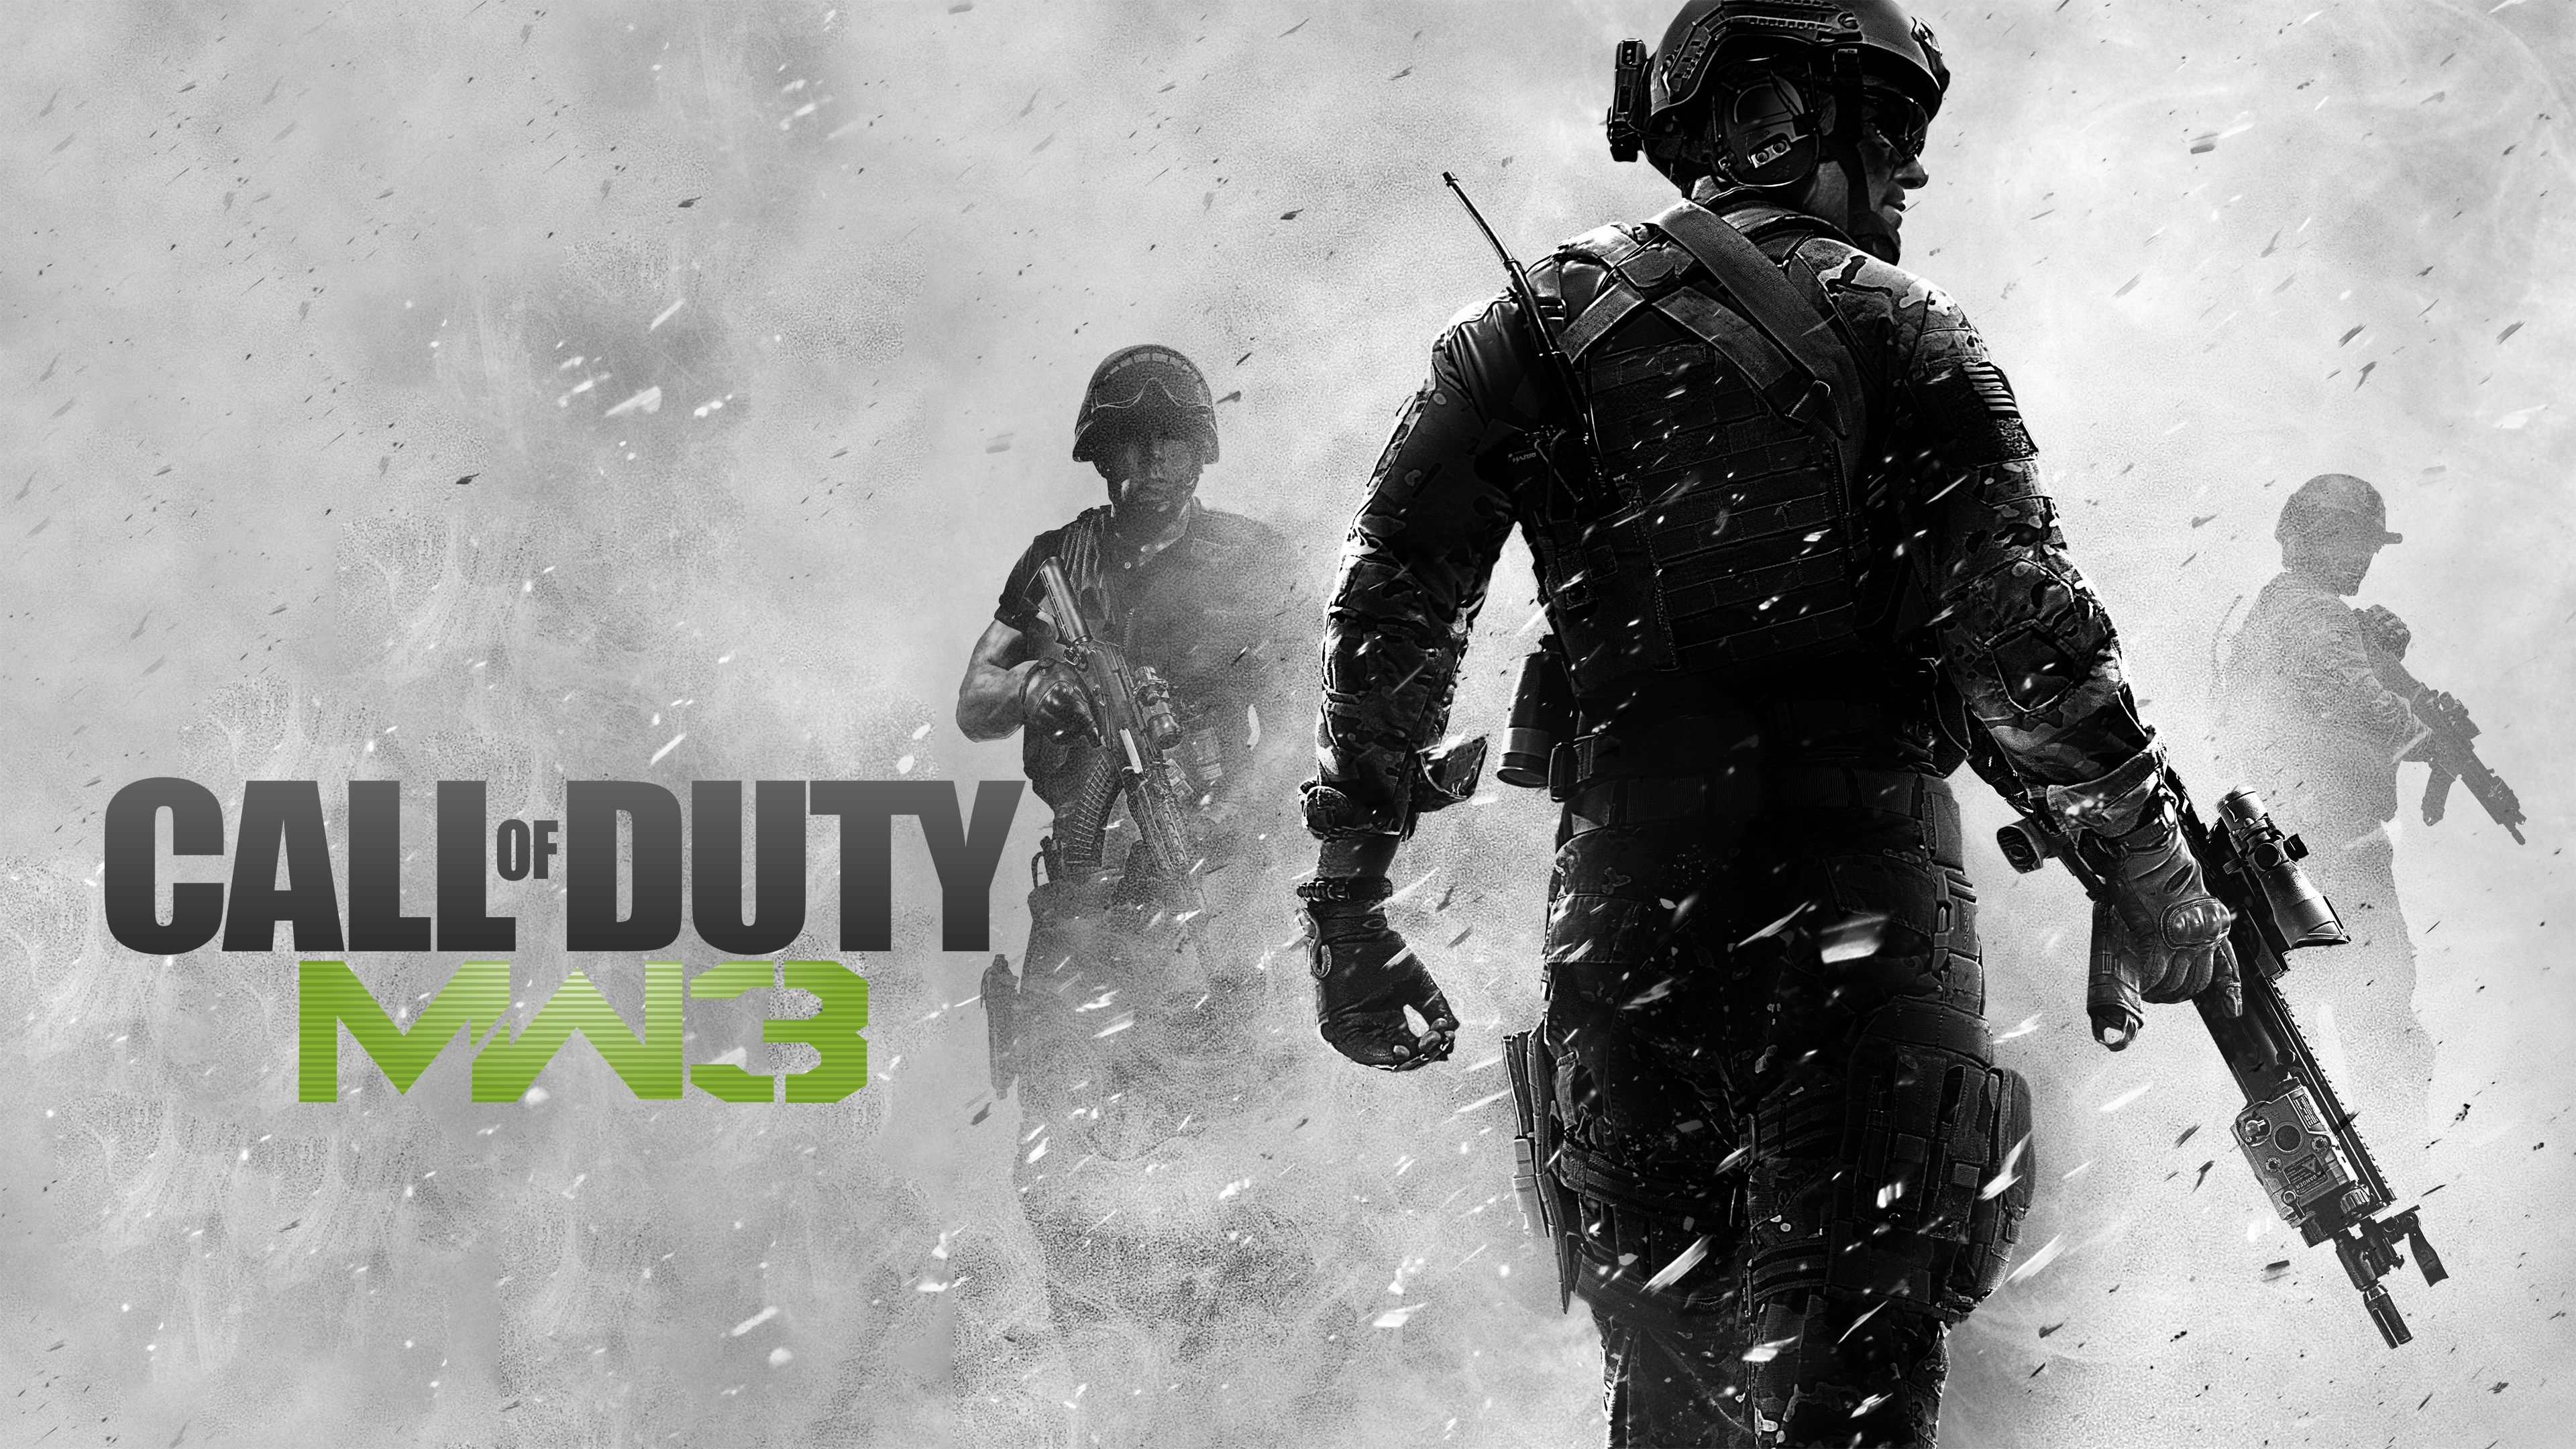 Call Of Duty Modern Warfare 3 4k Hd Games 4k Wallpapers Images Modern Warfare Call Of Duty Hd 1080p